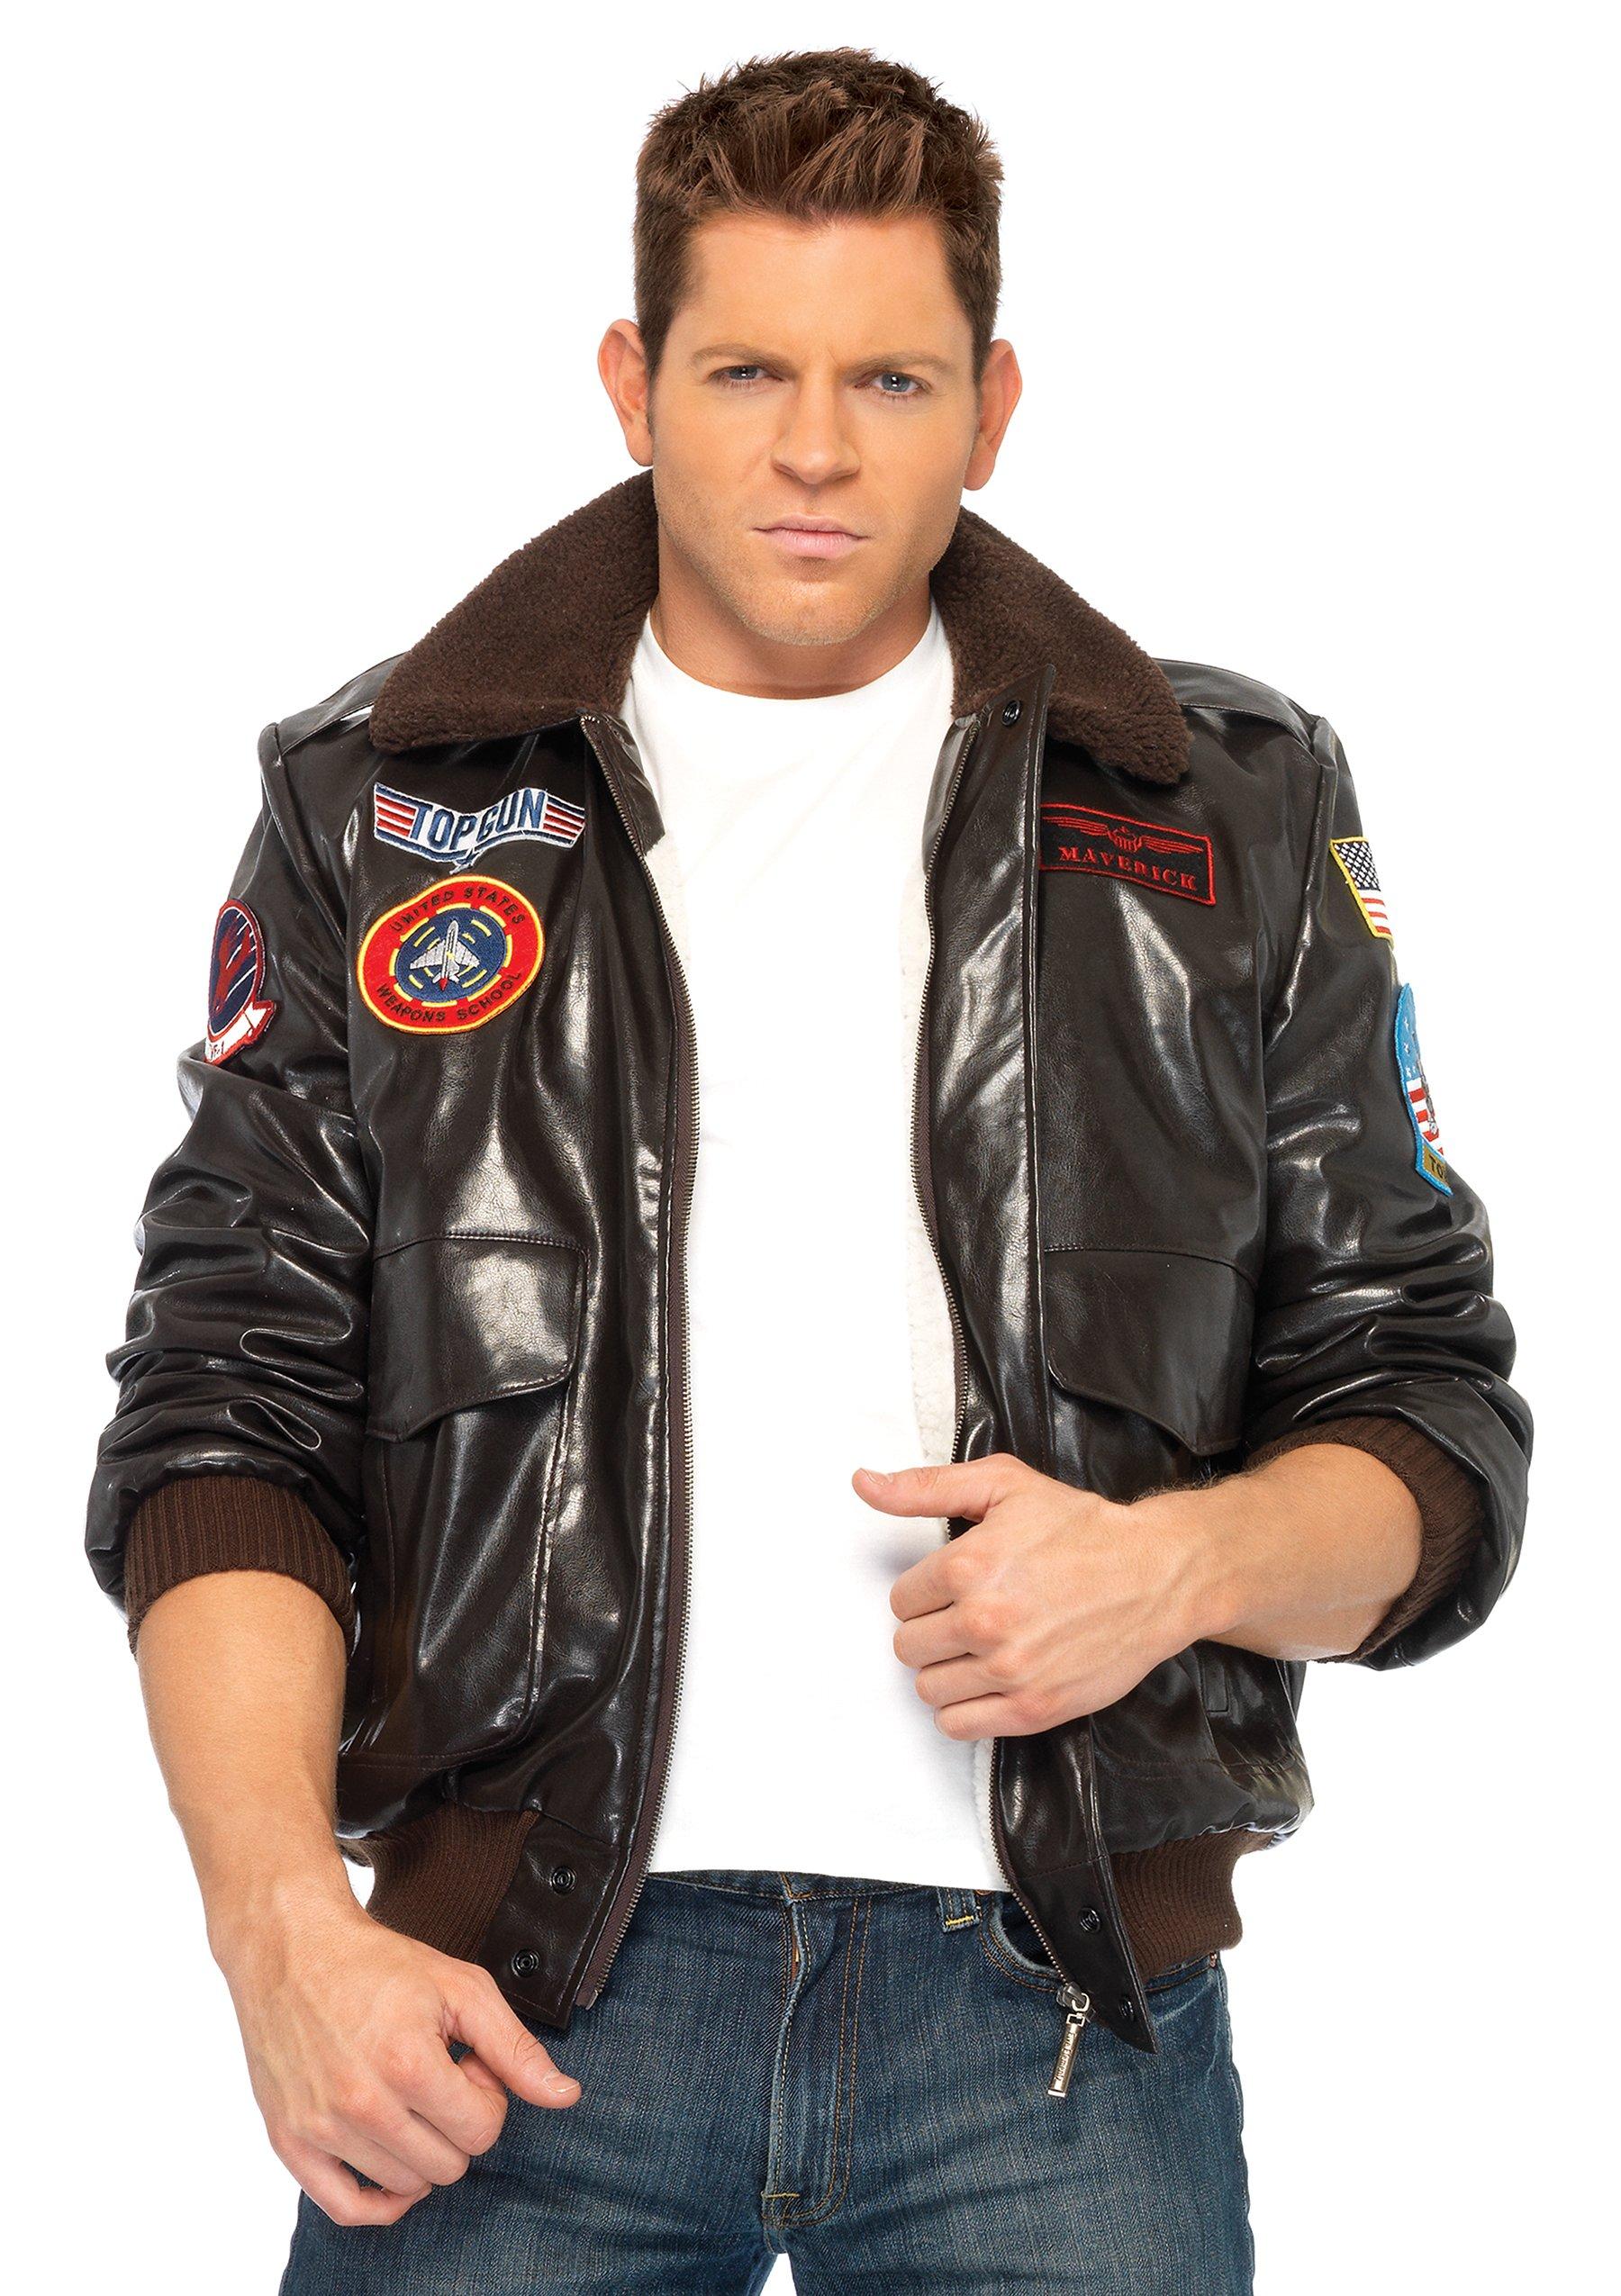 Leg Avenue Men's Top Gun Bomber Jacket, Brown, Medium by Leg Avenue